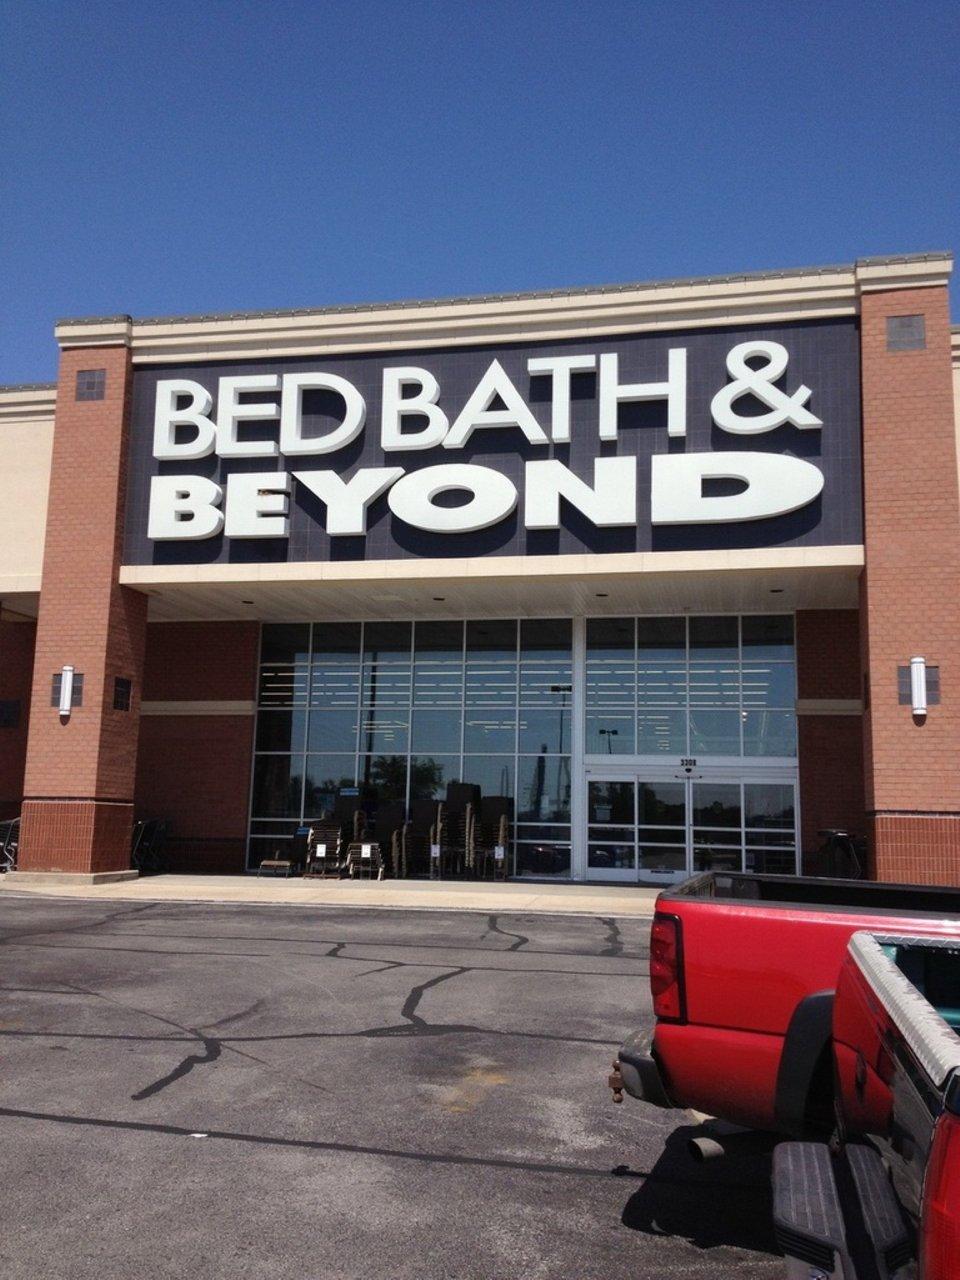 Bed Bath & Beyond 3308 S Glenstone Ave, Springfield